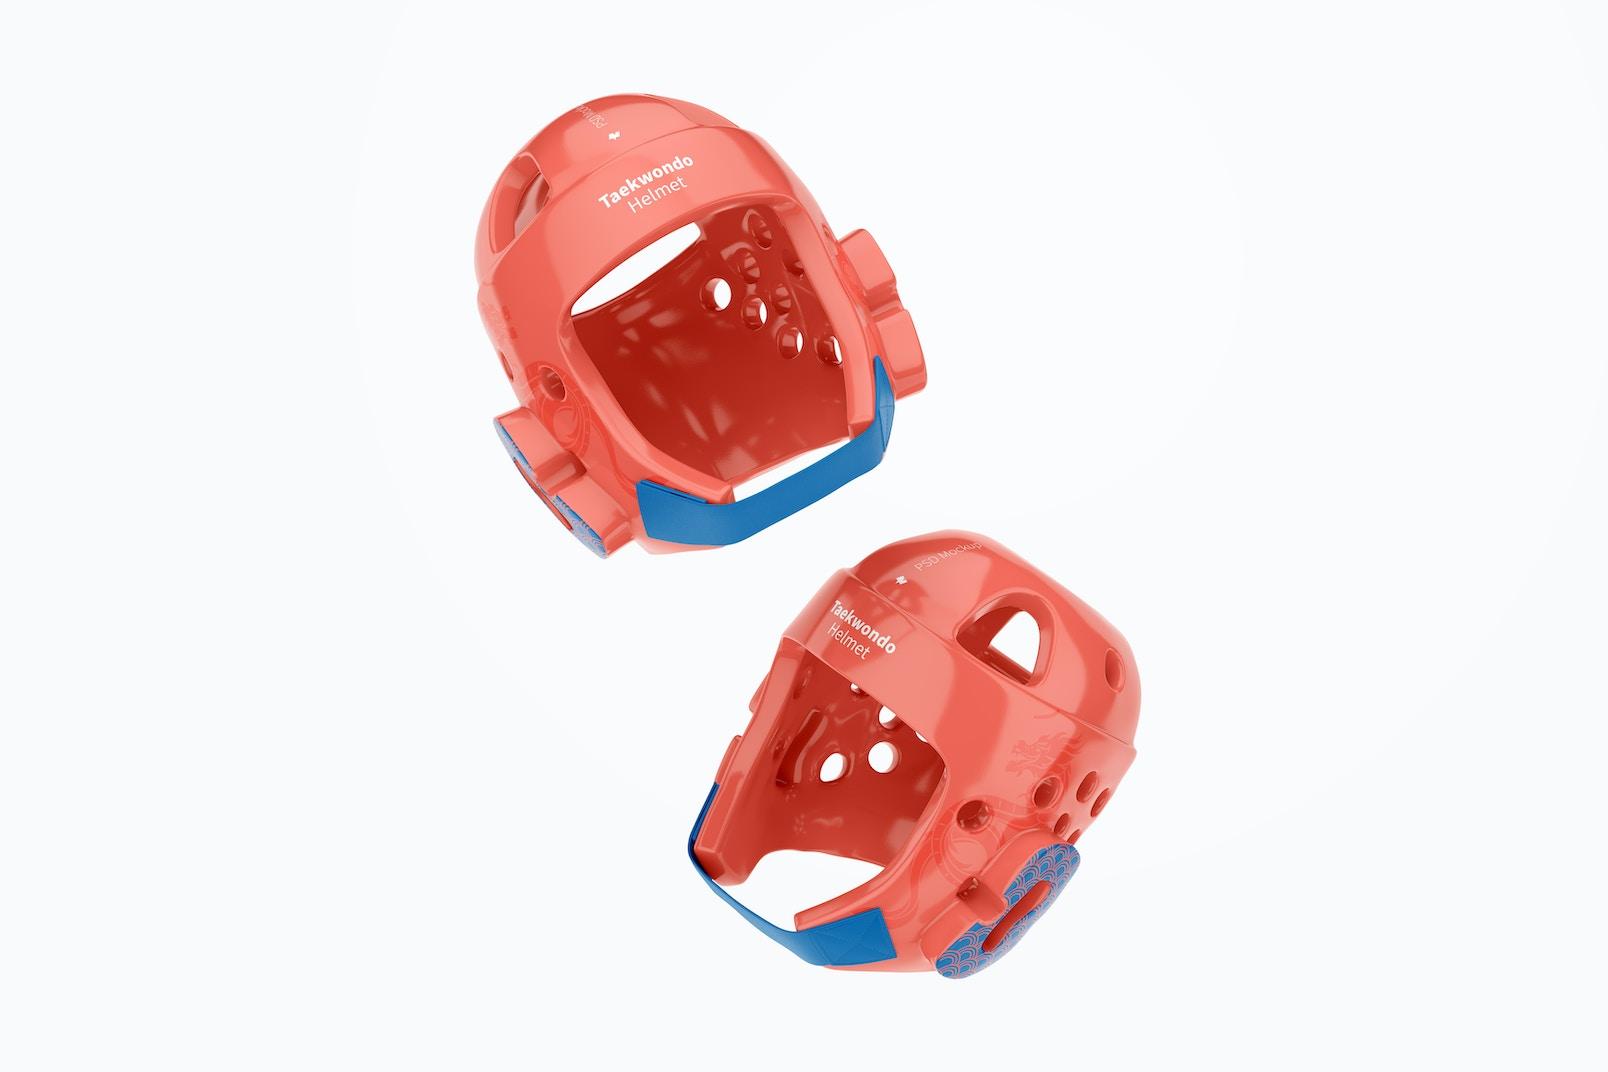 Taekwondo Helmets Mockup, Floating